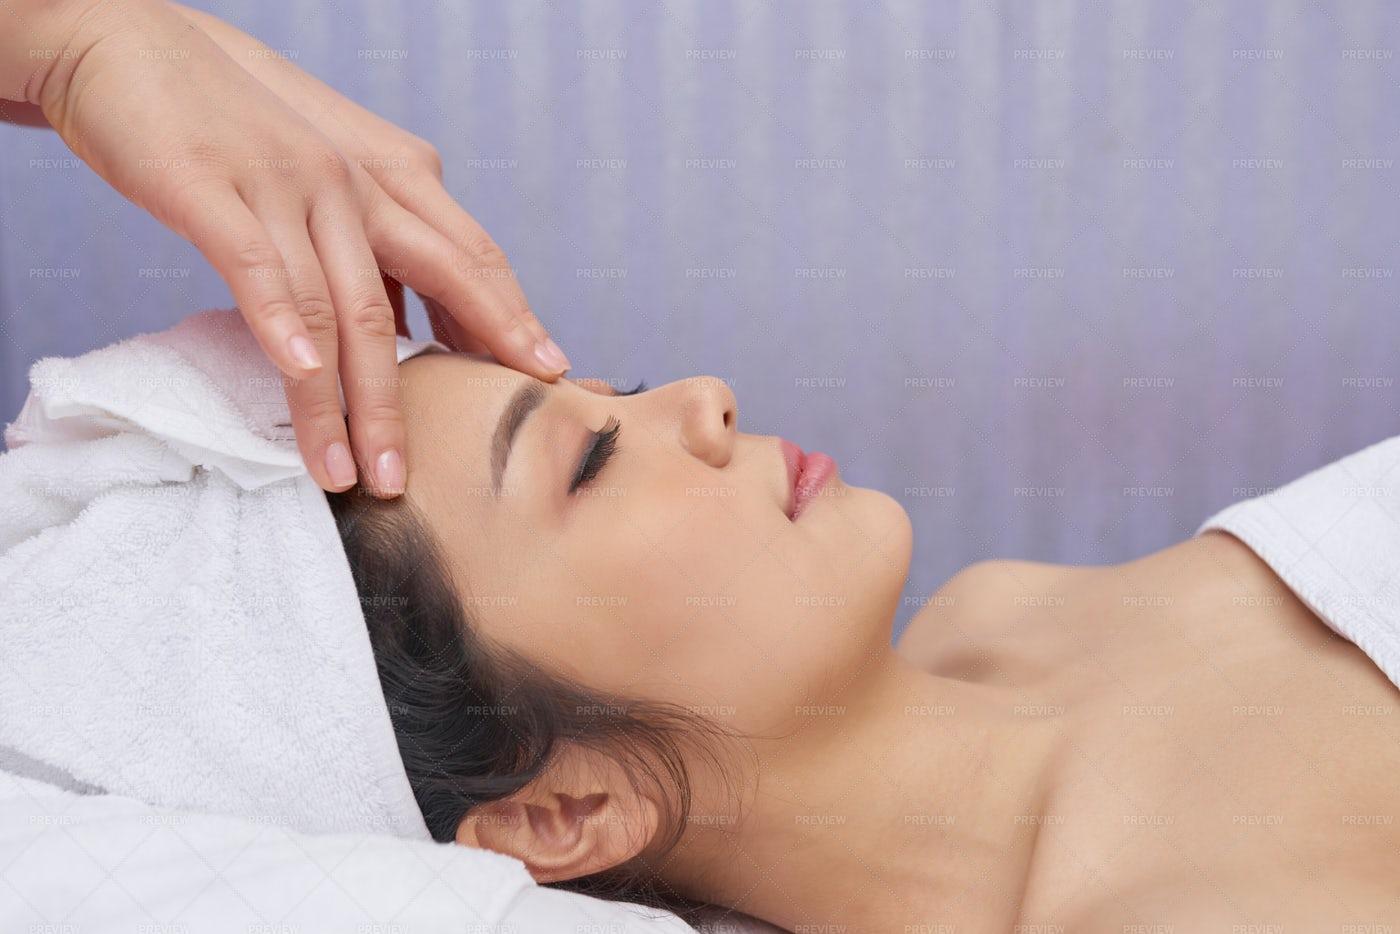 Woman Relaxing At Spa Procedure: Stock Photos